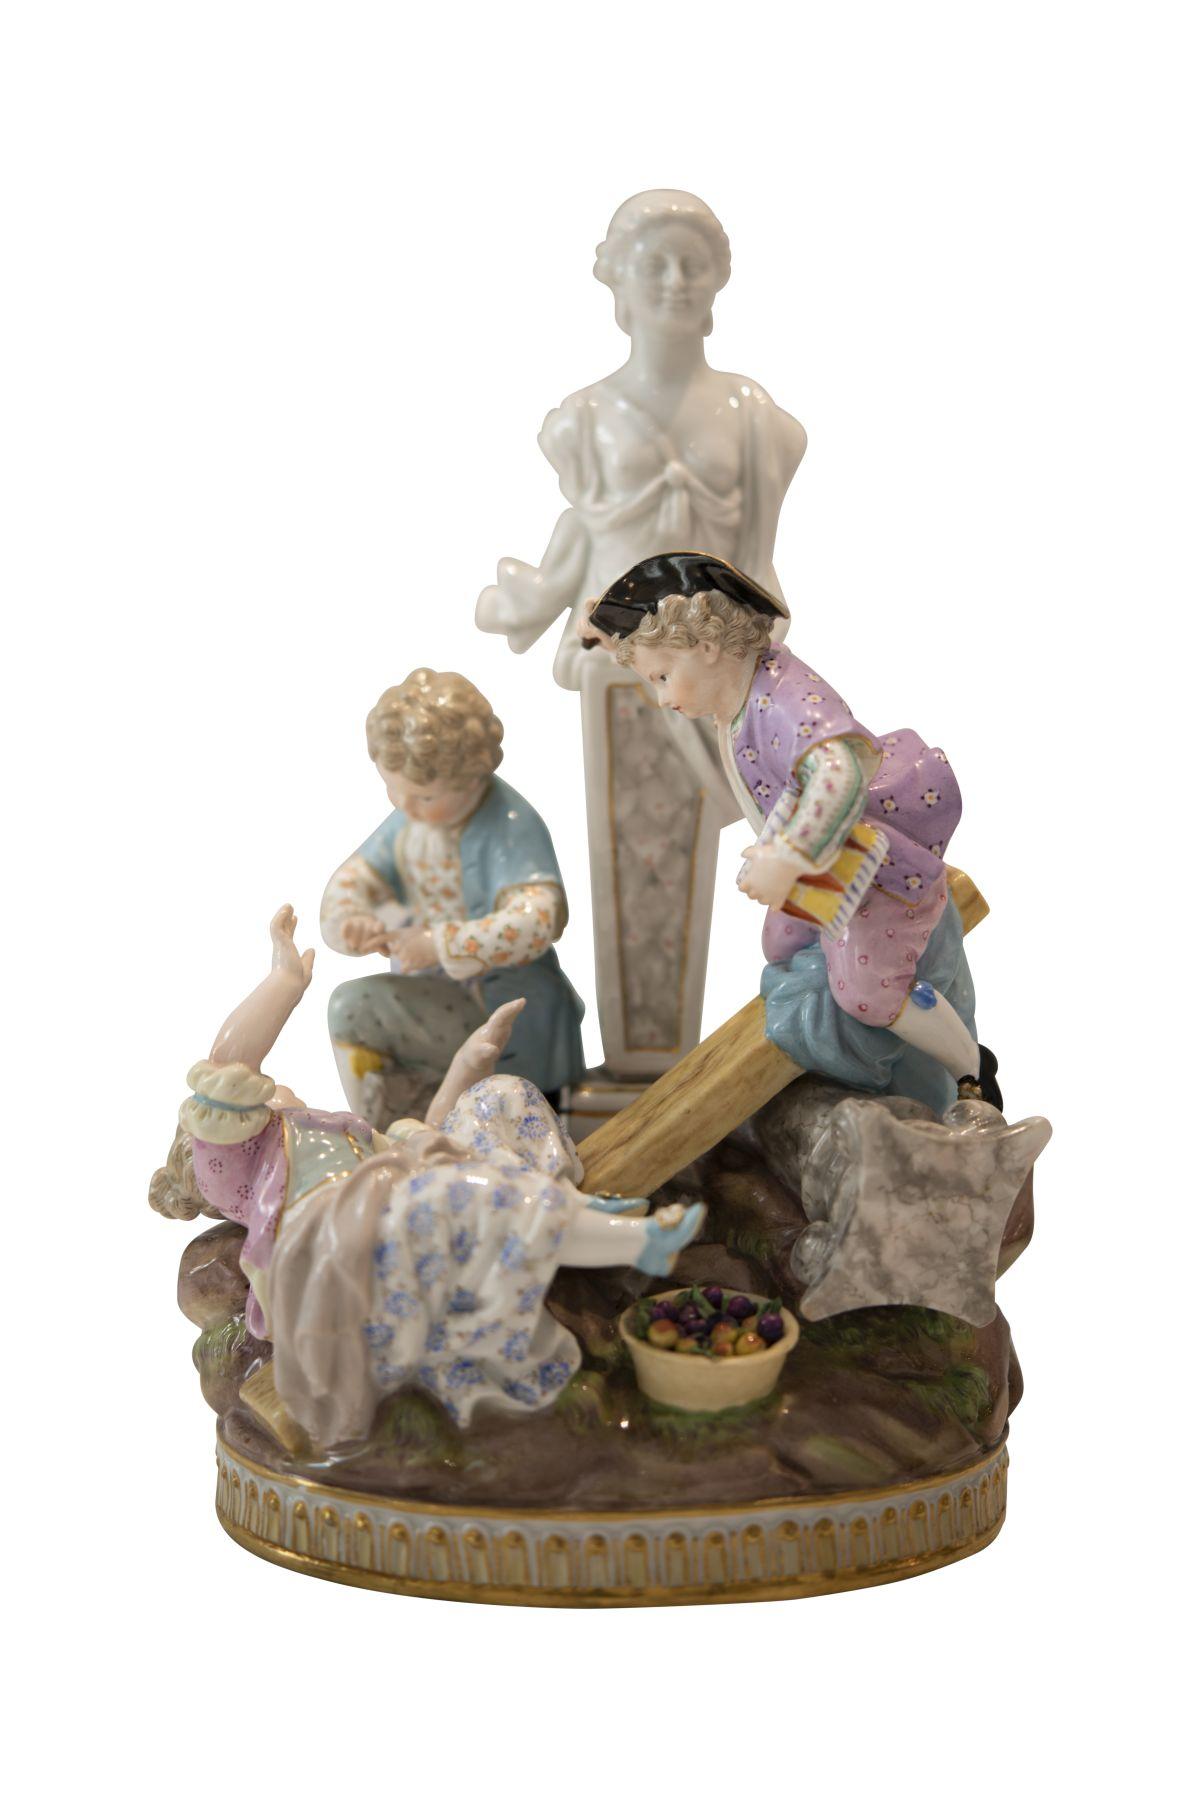 "#265 Group of figures ""Playing children"" Meissen | Figurengruppe ""Spielende Kinder"" Meissen Image"